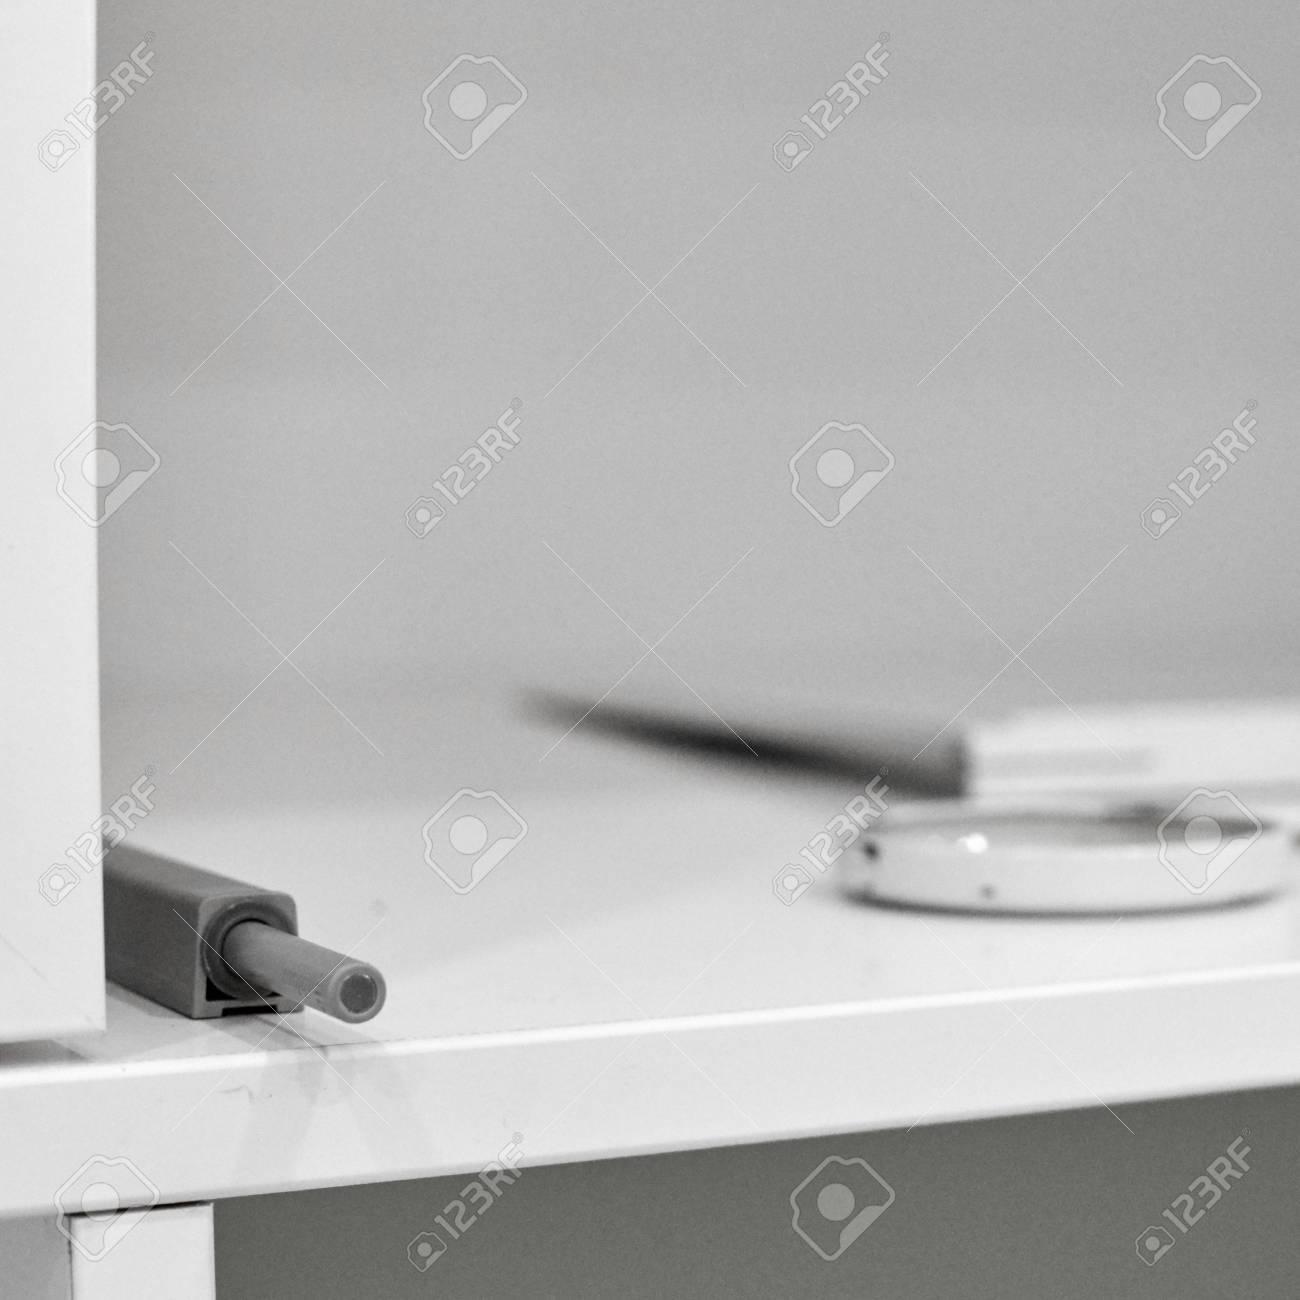 home and latch furniture at repairing for doors door magnetic stock photo ruler